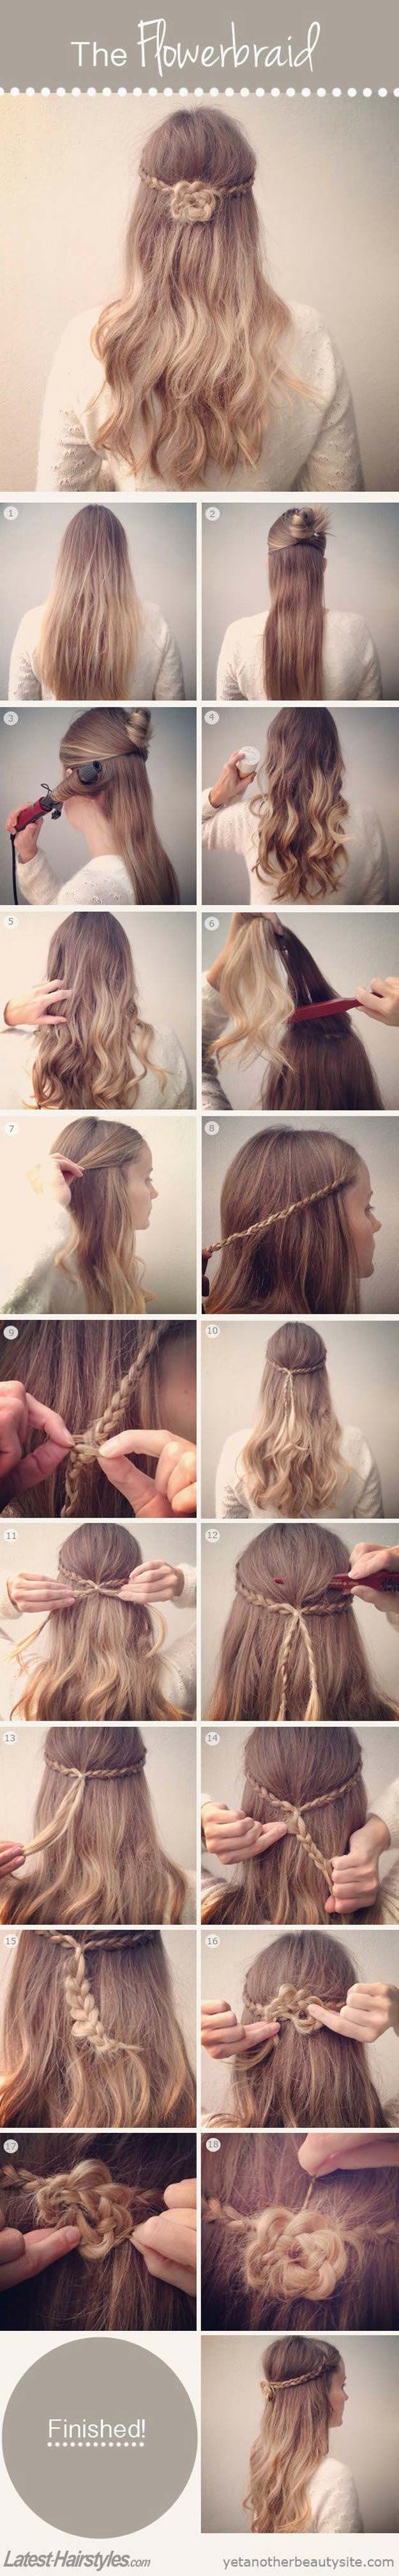 Best 25 How to braid cornrows ideas on Pinterest